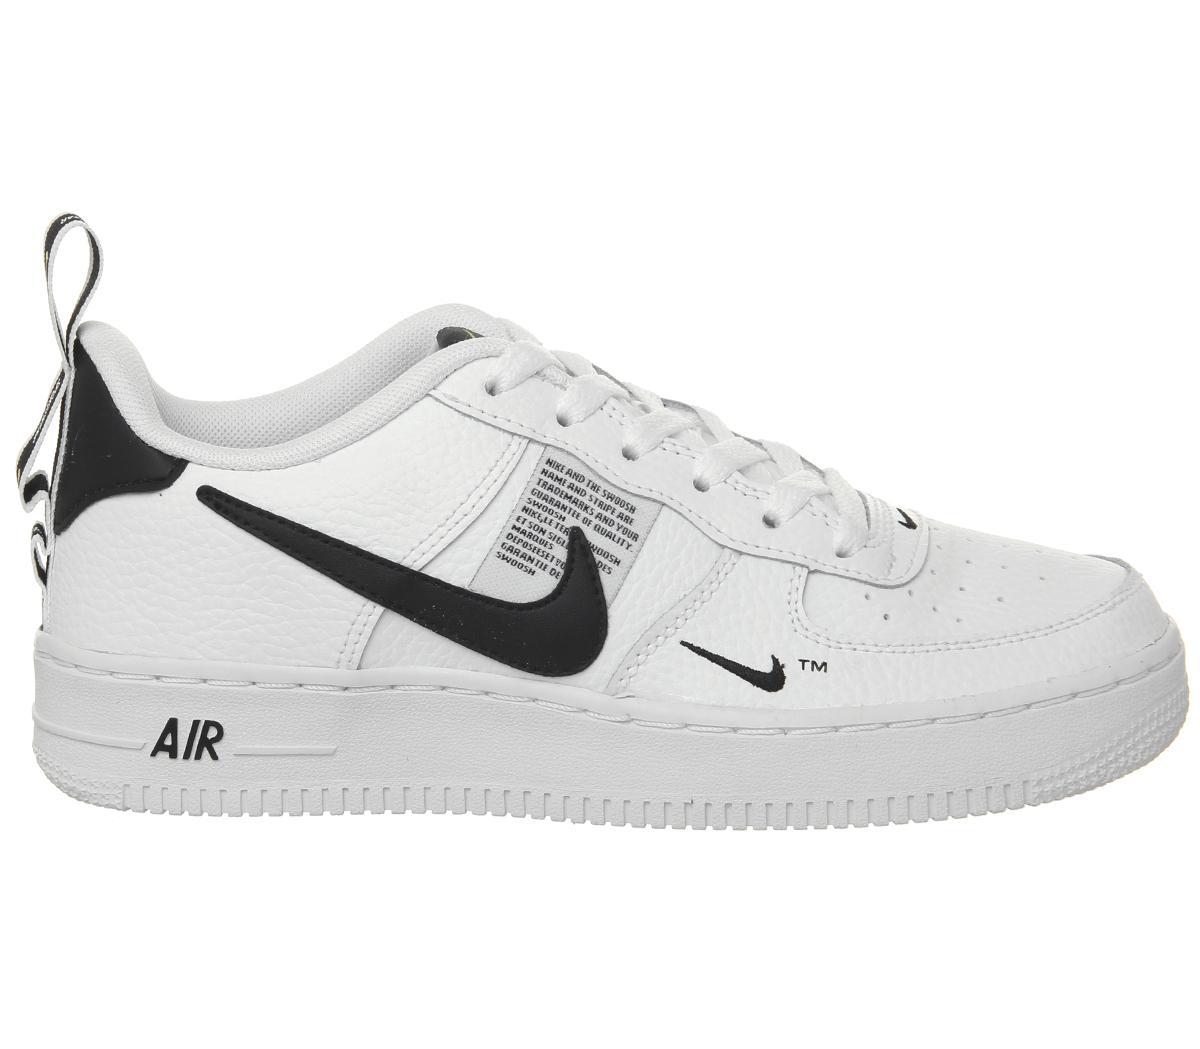 Wmns Air Force 1 07 White Black - Nike - 315115 152   GOAT